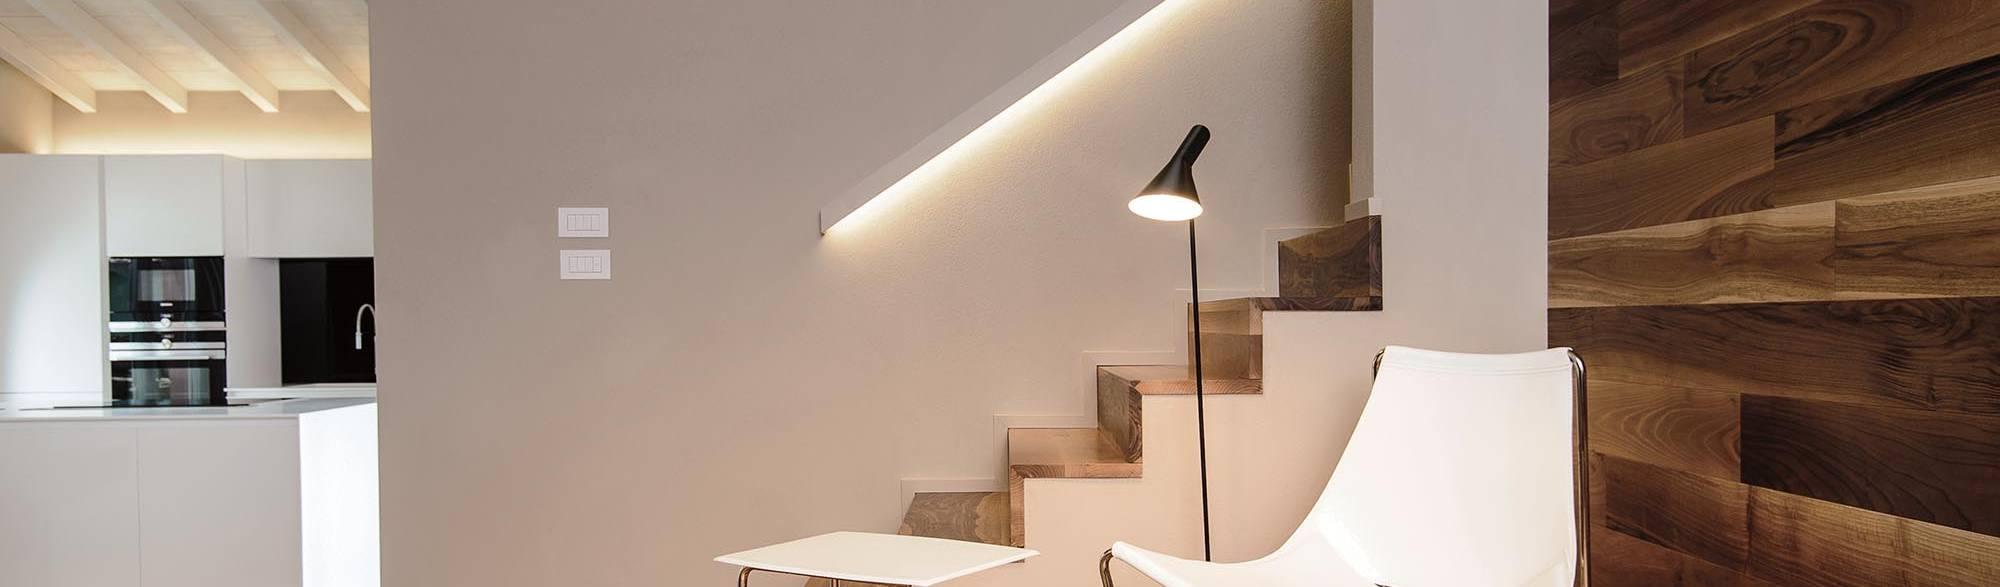 Rachele Biancalani Studio—Architecture & Design